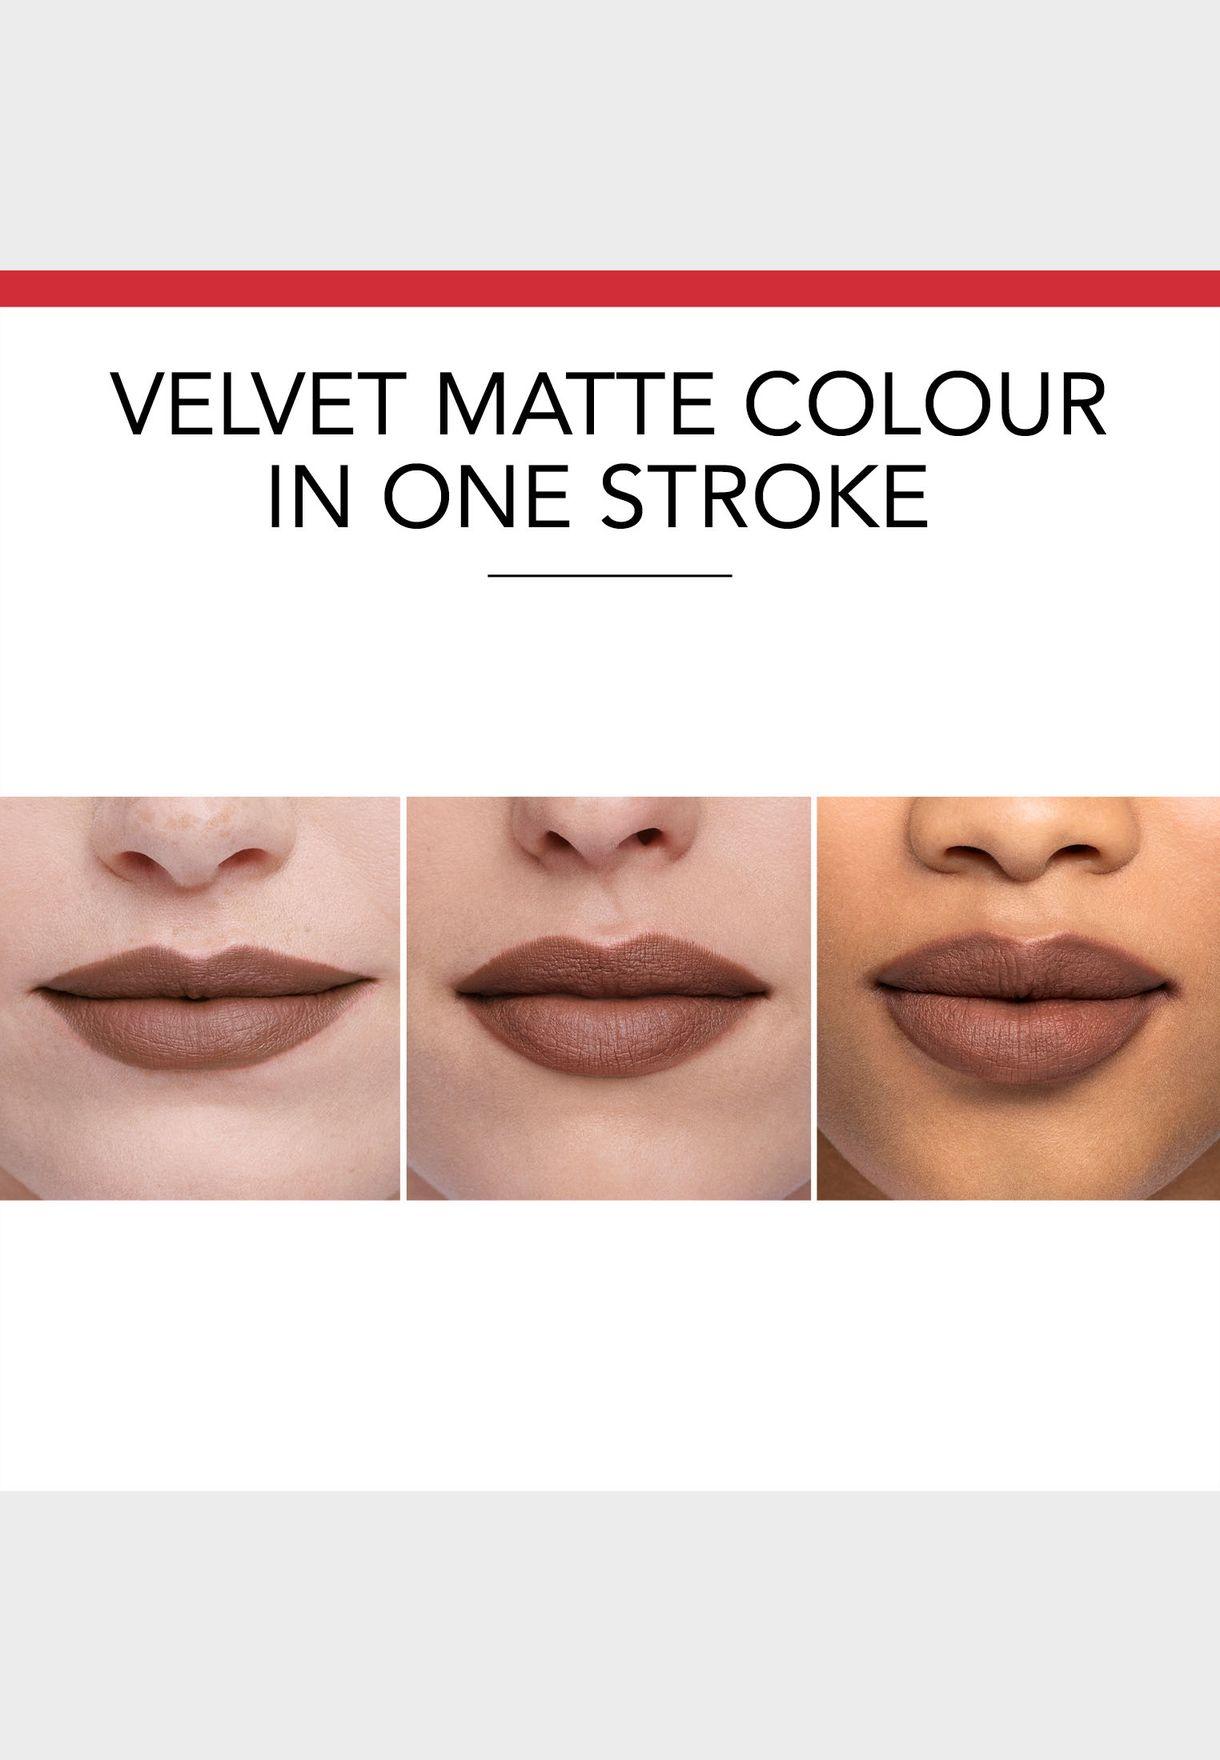 Rouge Velvet The Lipstick 23 Taupe of Paris